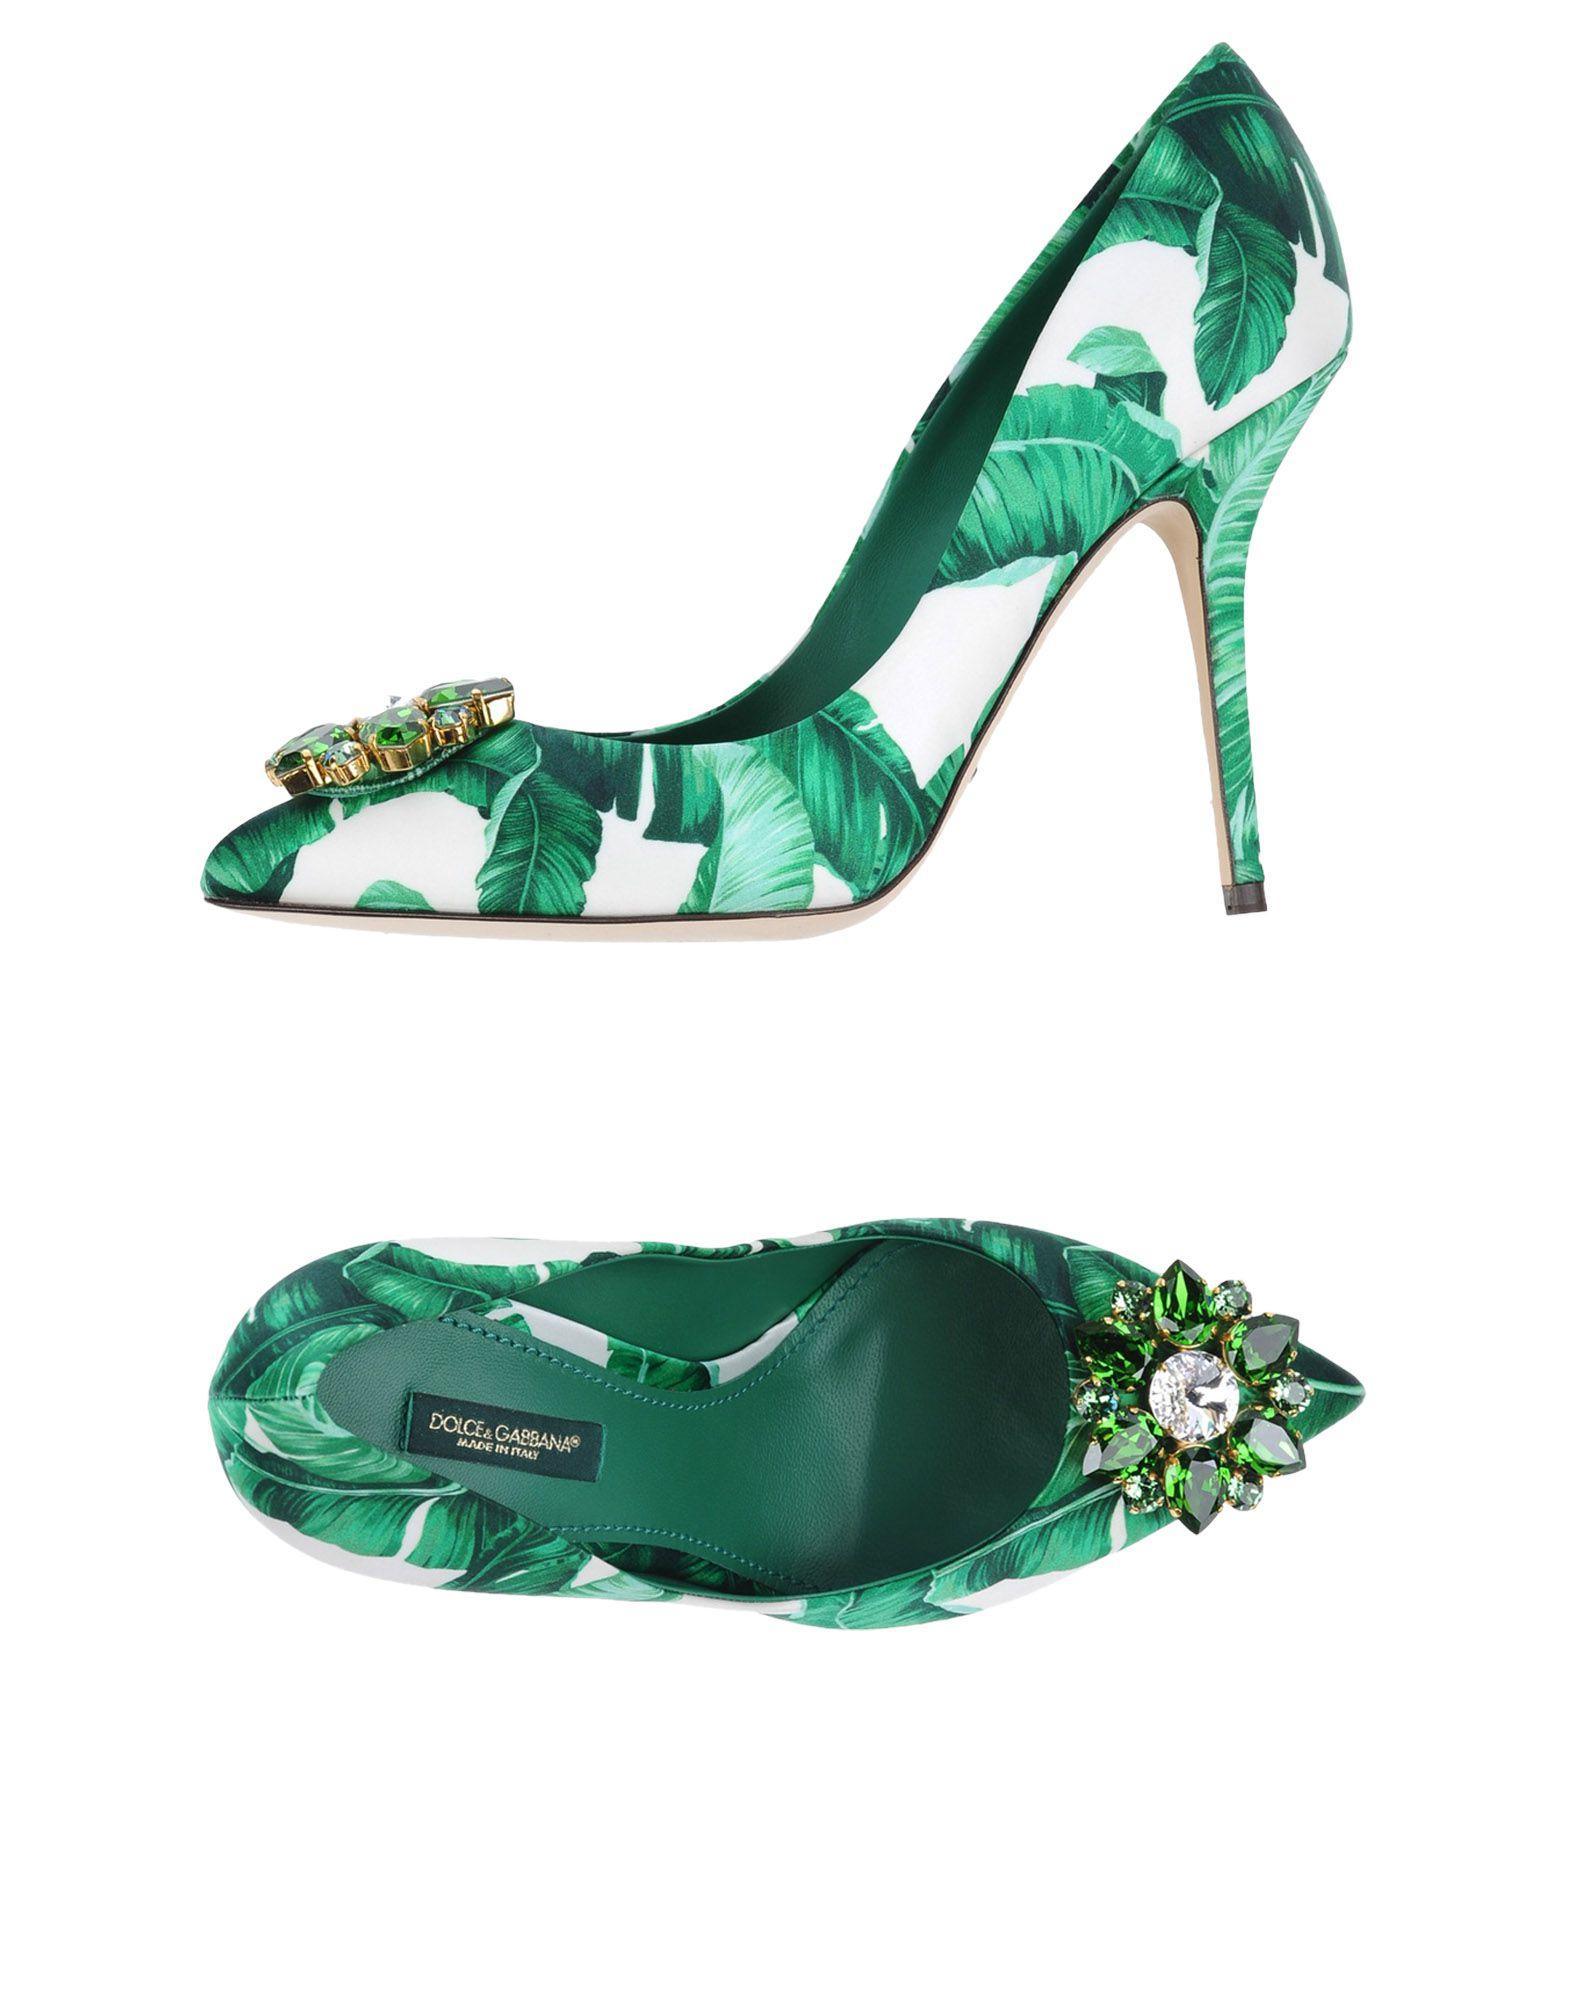 cc58bb3afe7 Lyst - Dolce   Gabbana Pump in Green